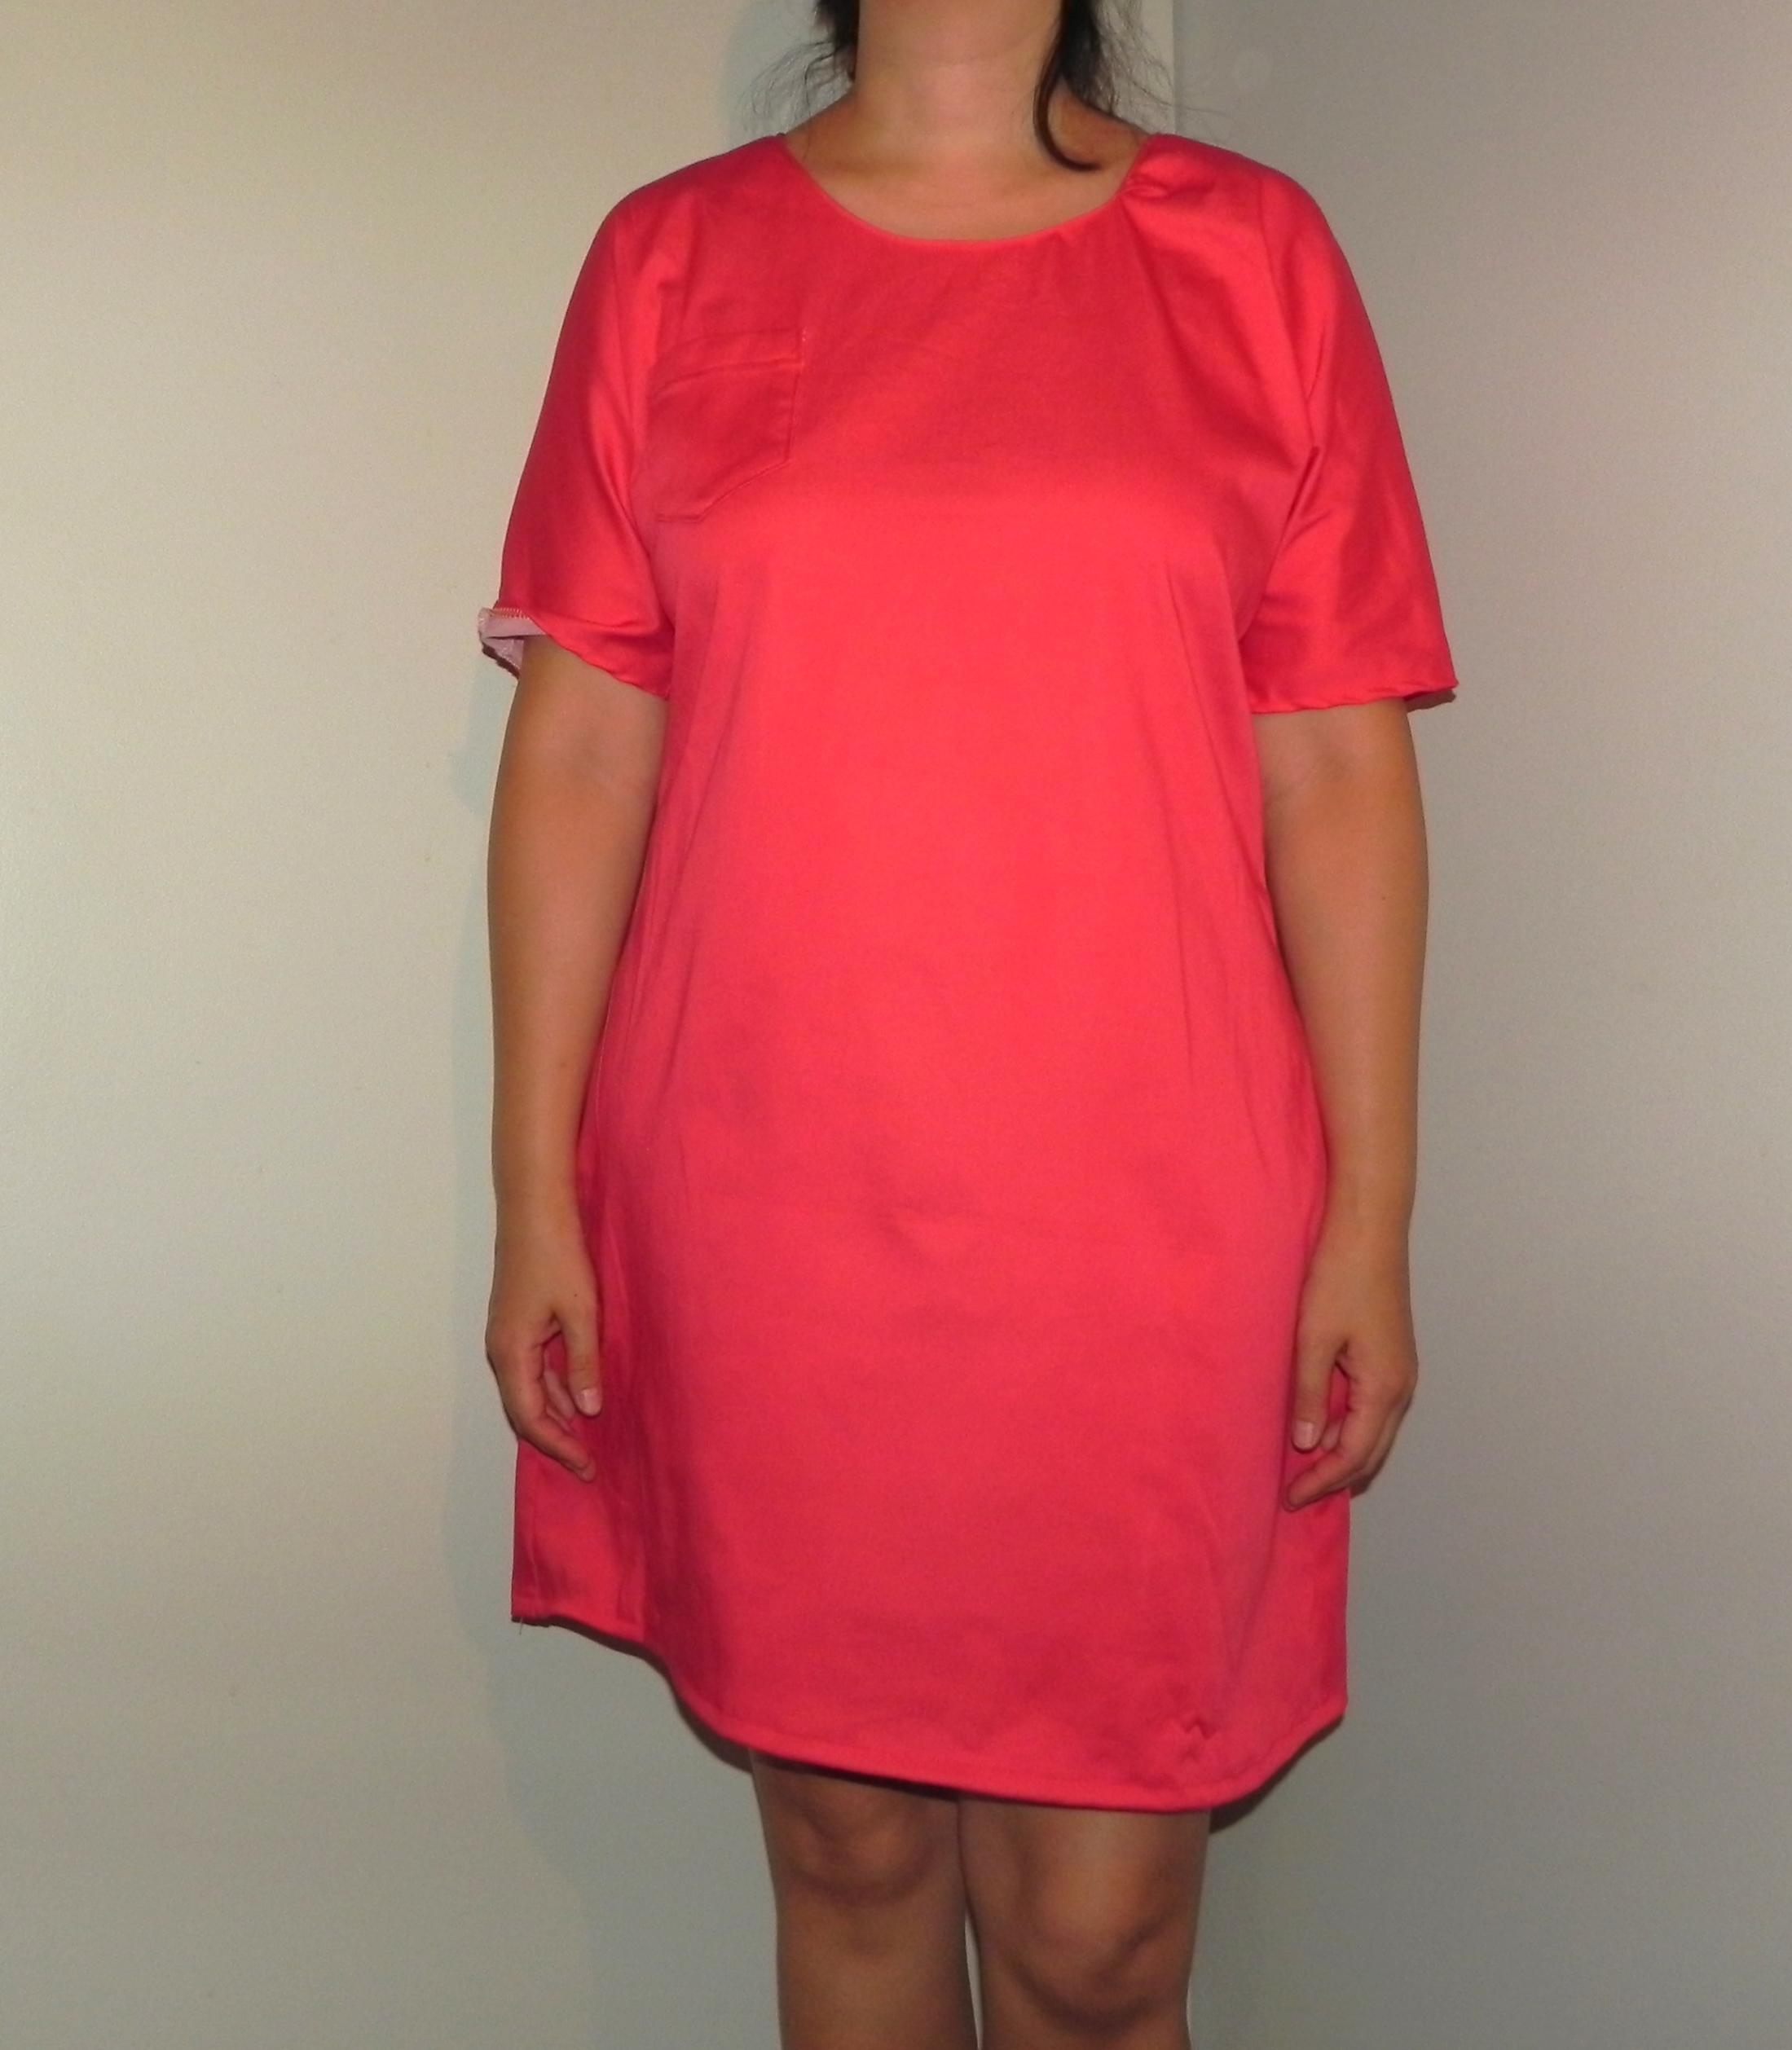 Robe Arume rouge fit général